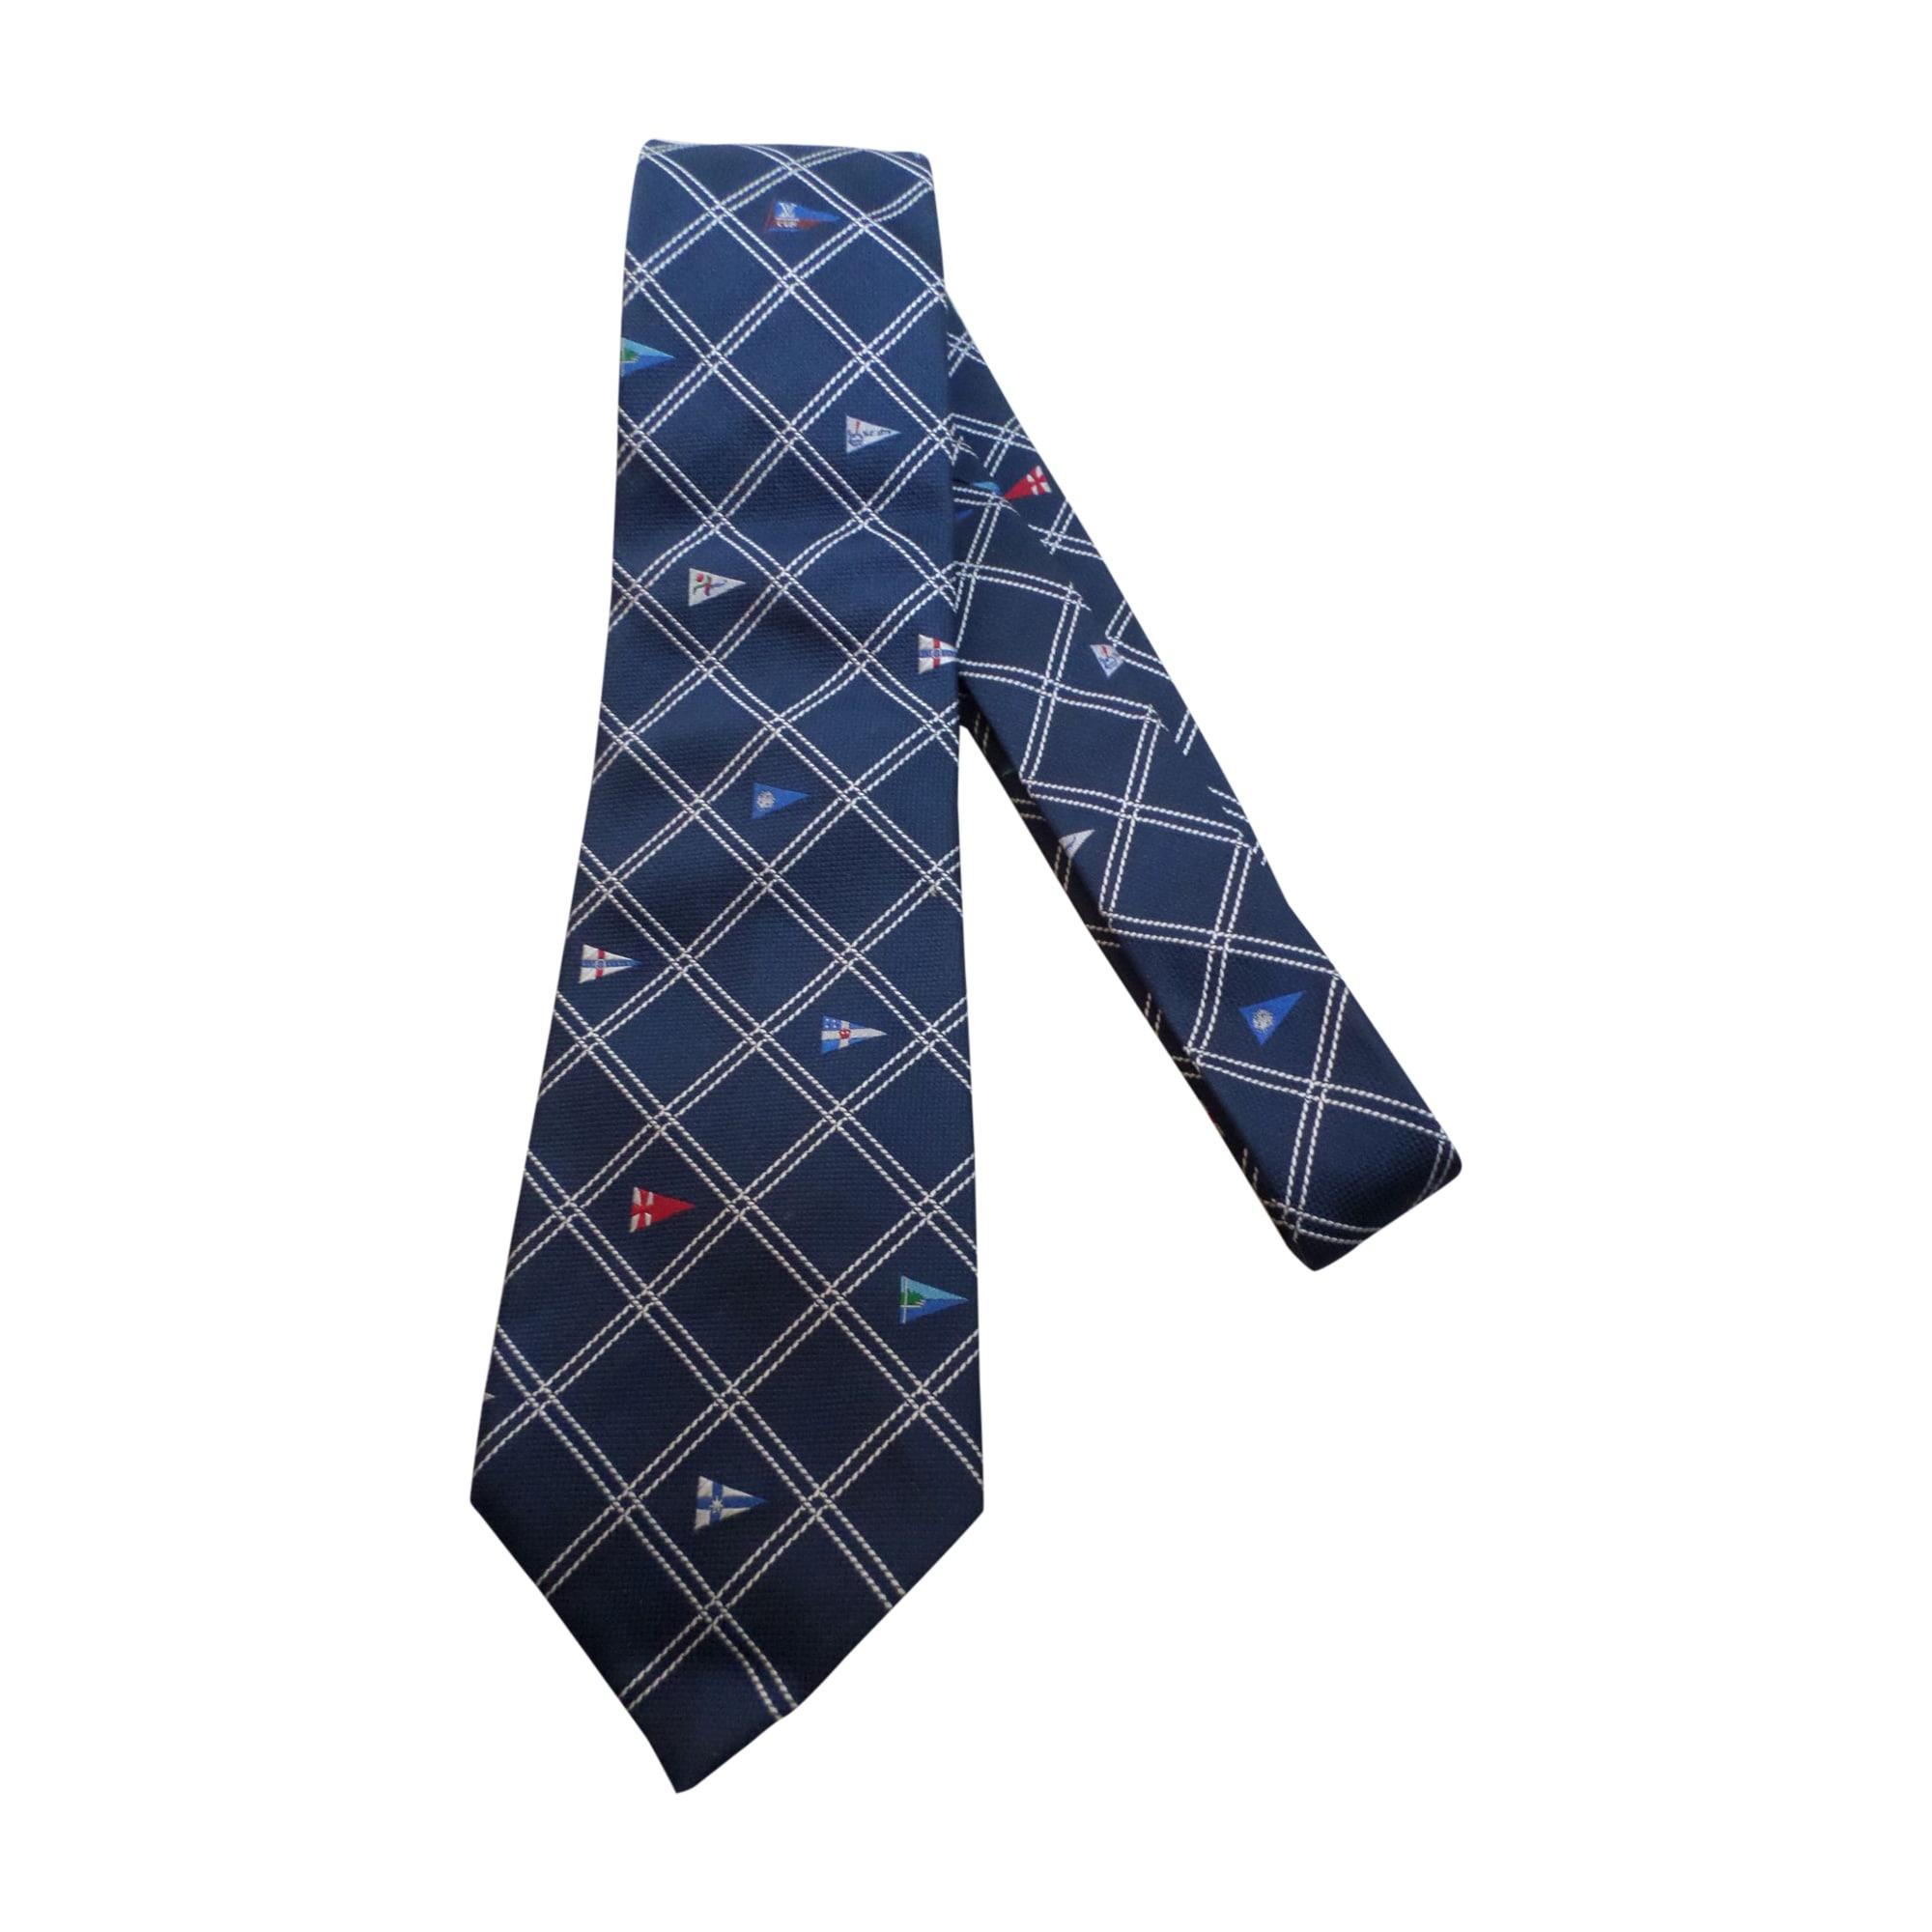 Cravate LOUIS VUITTON Bleu, bleu marine, bleu turquoise